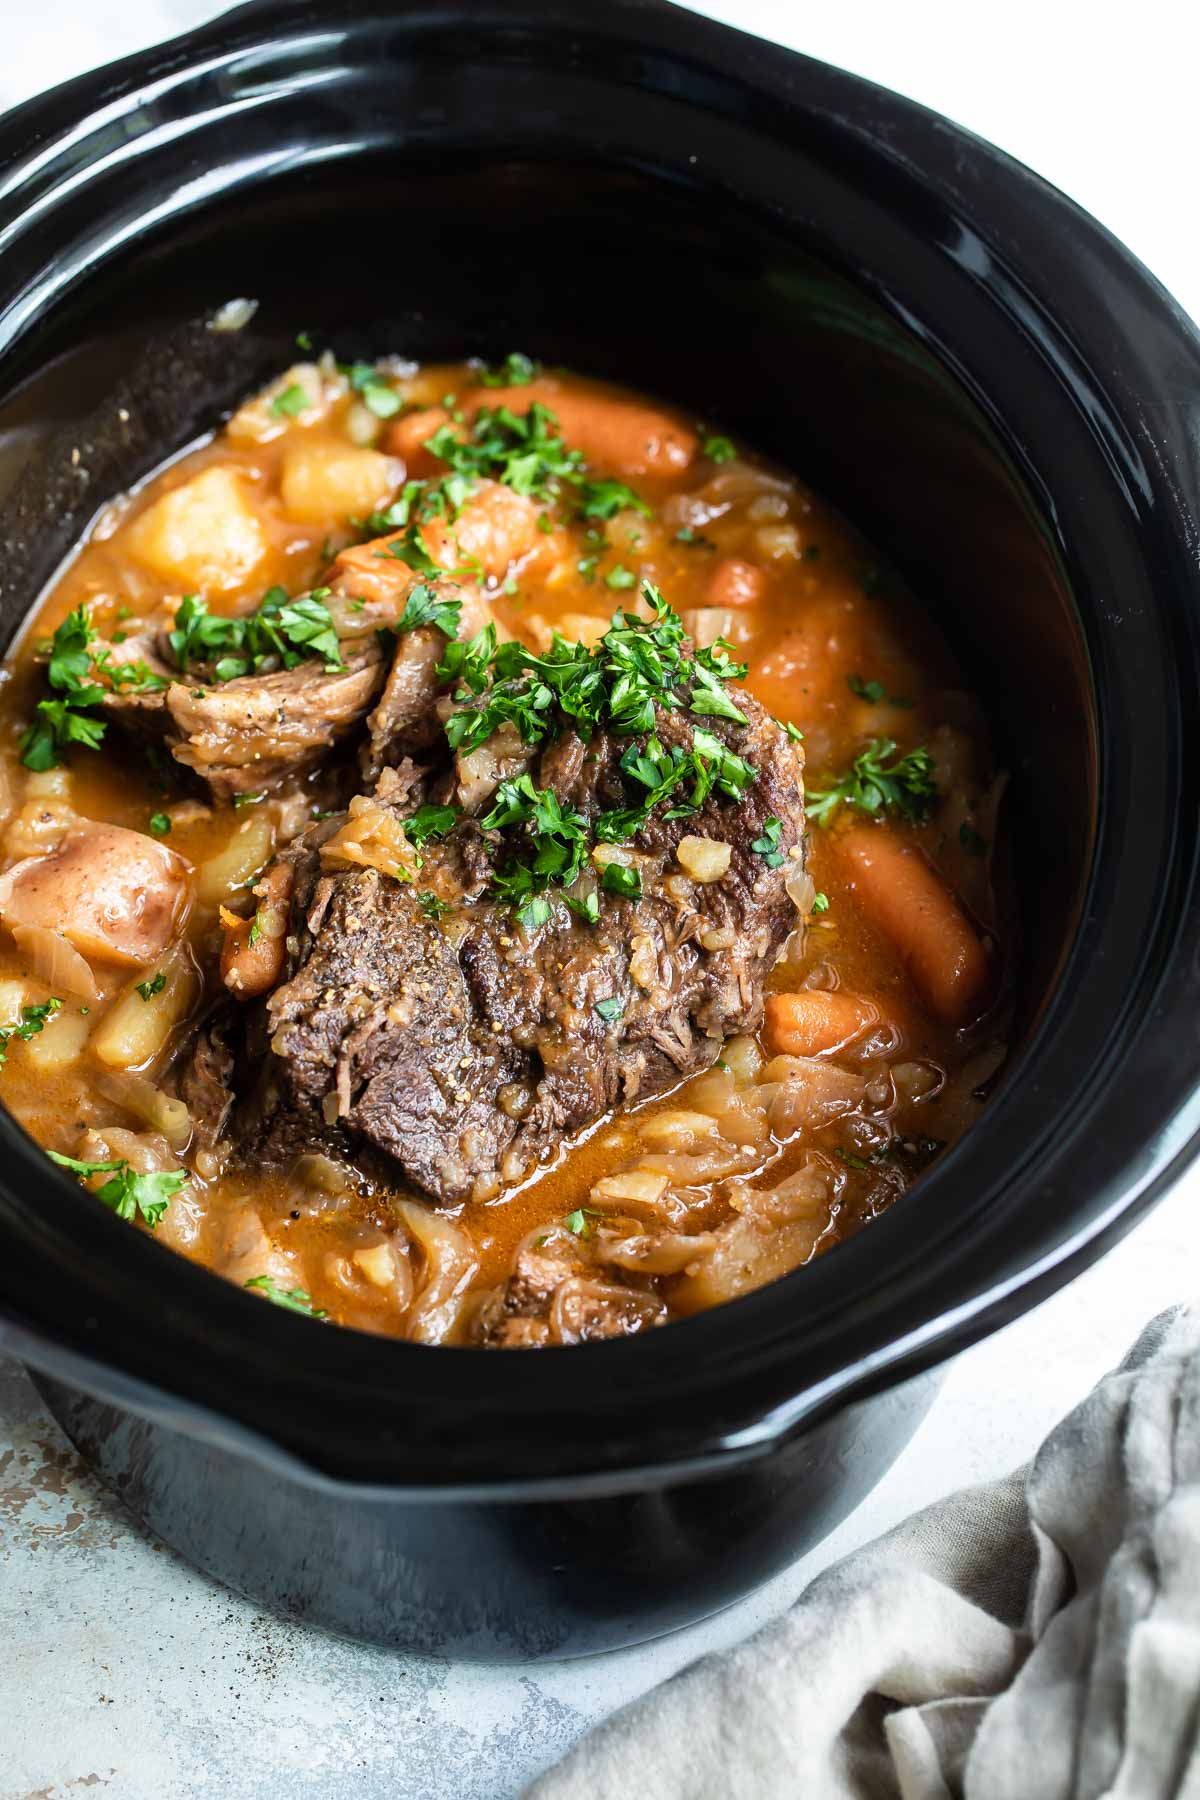 Pot roast in a crock pot.